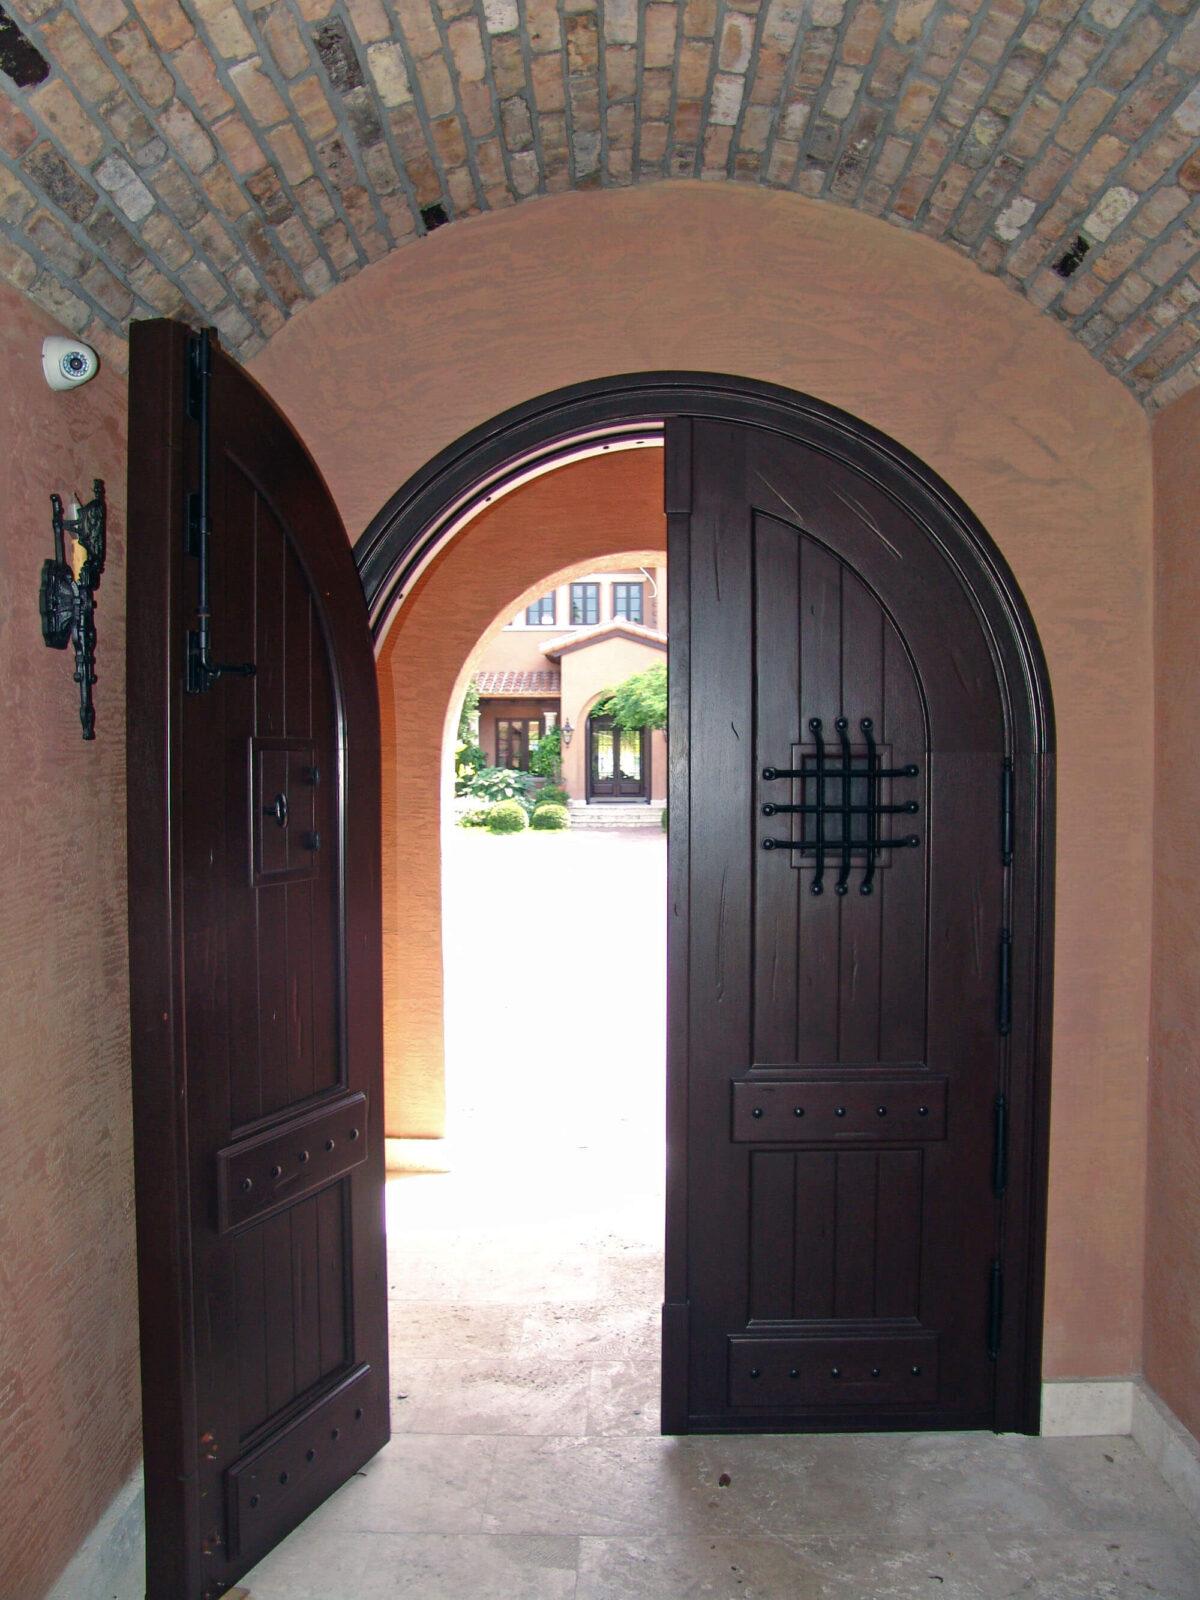 PALM ISLAND GATE DOOR.